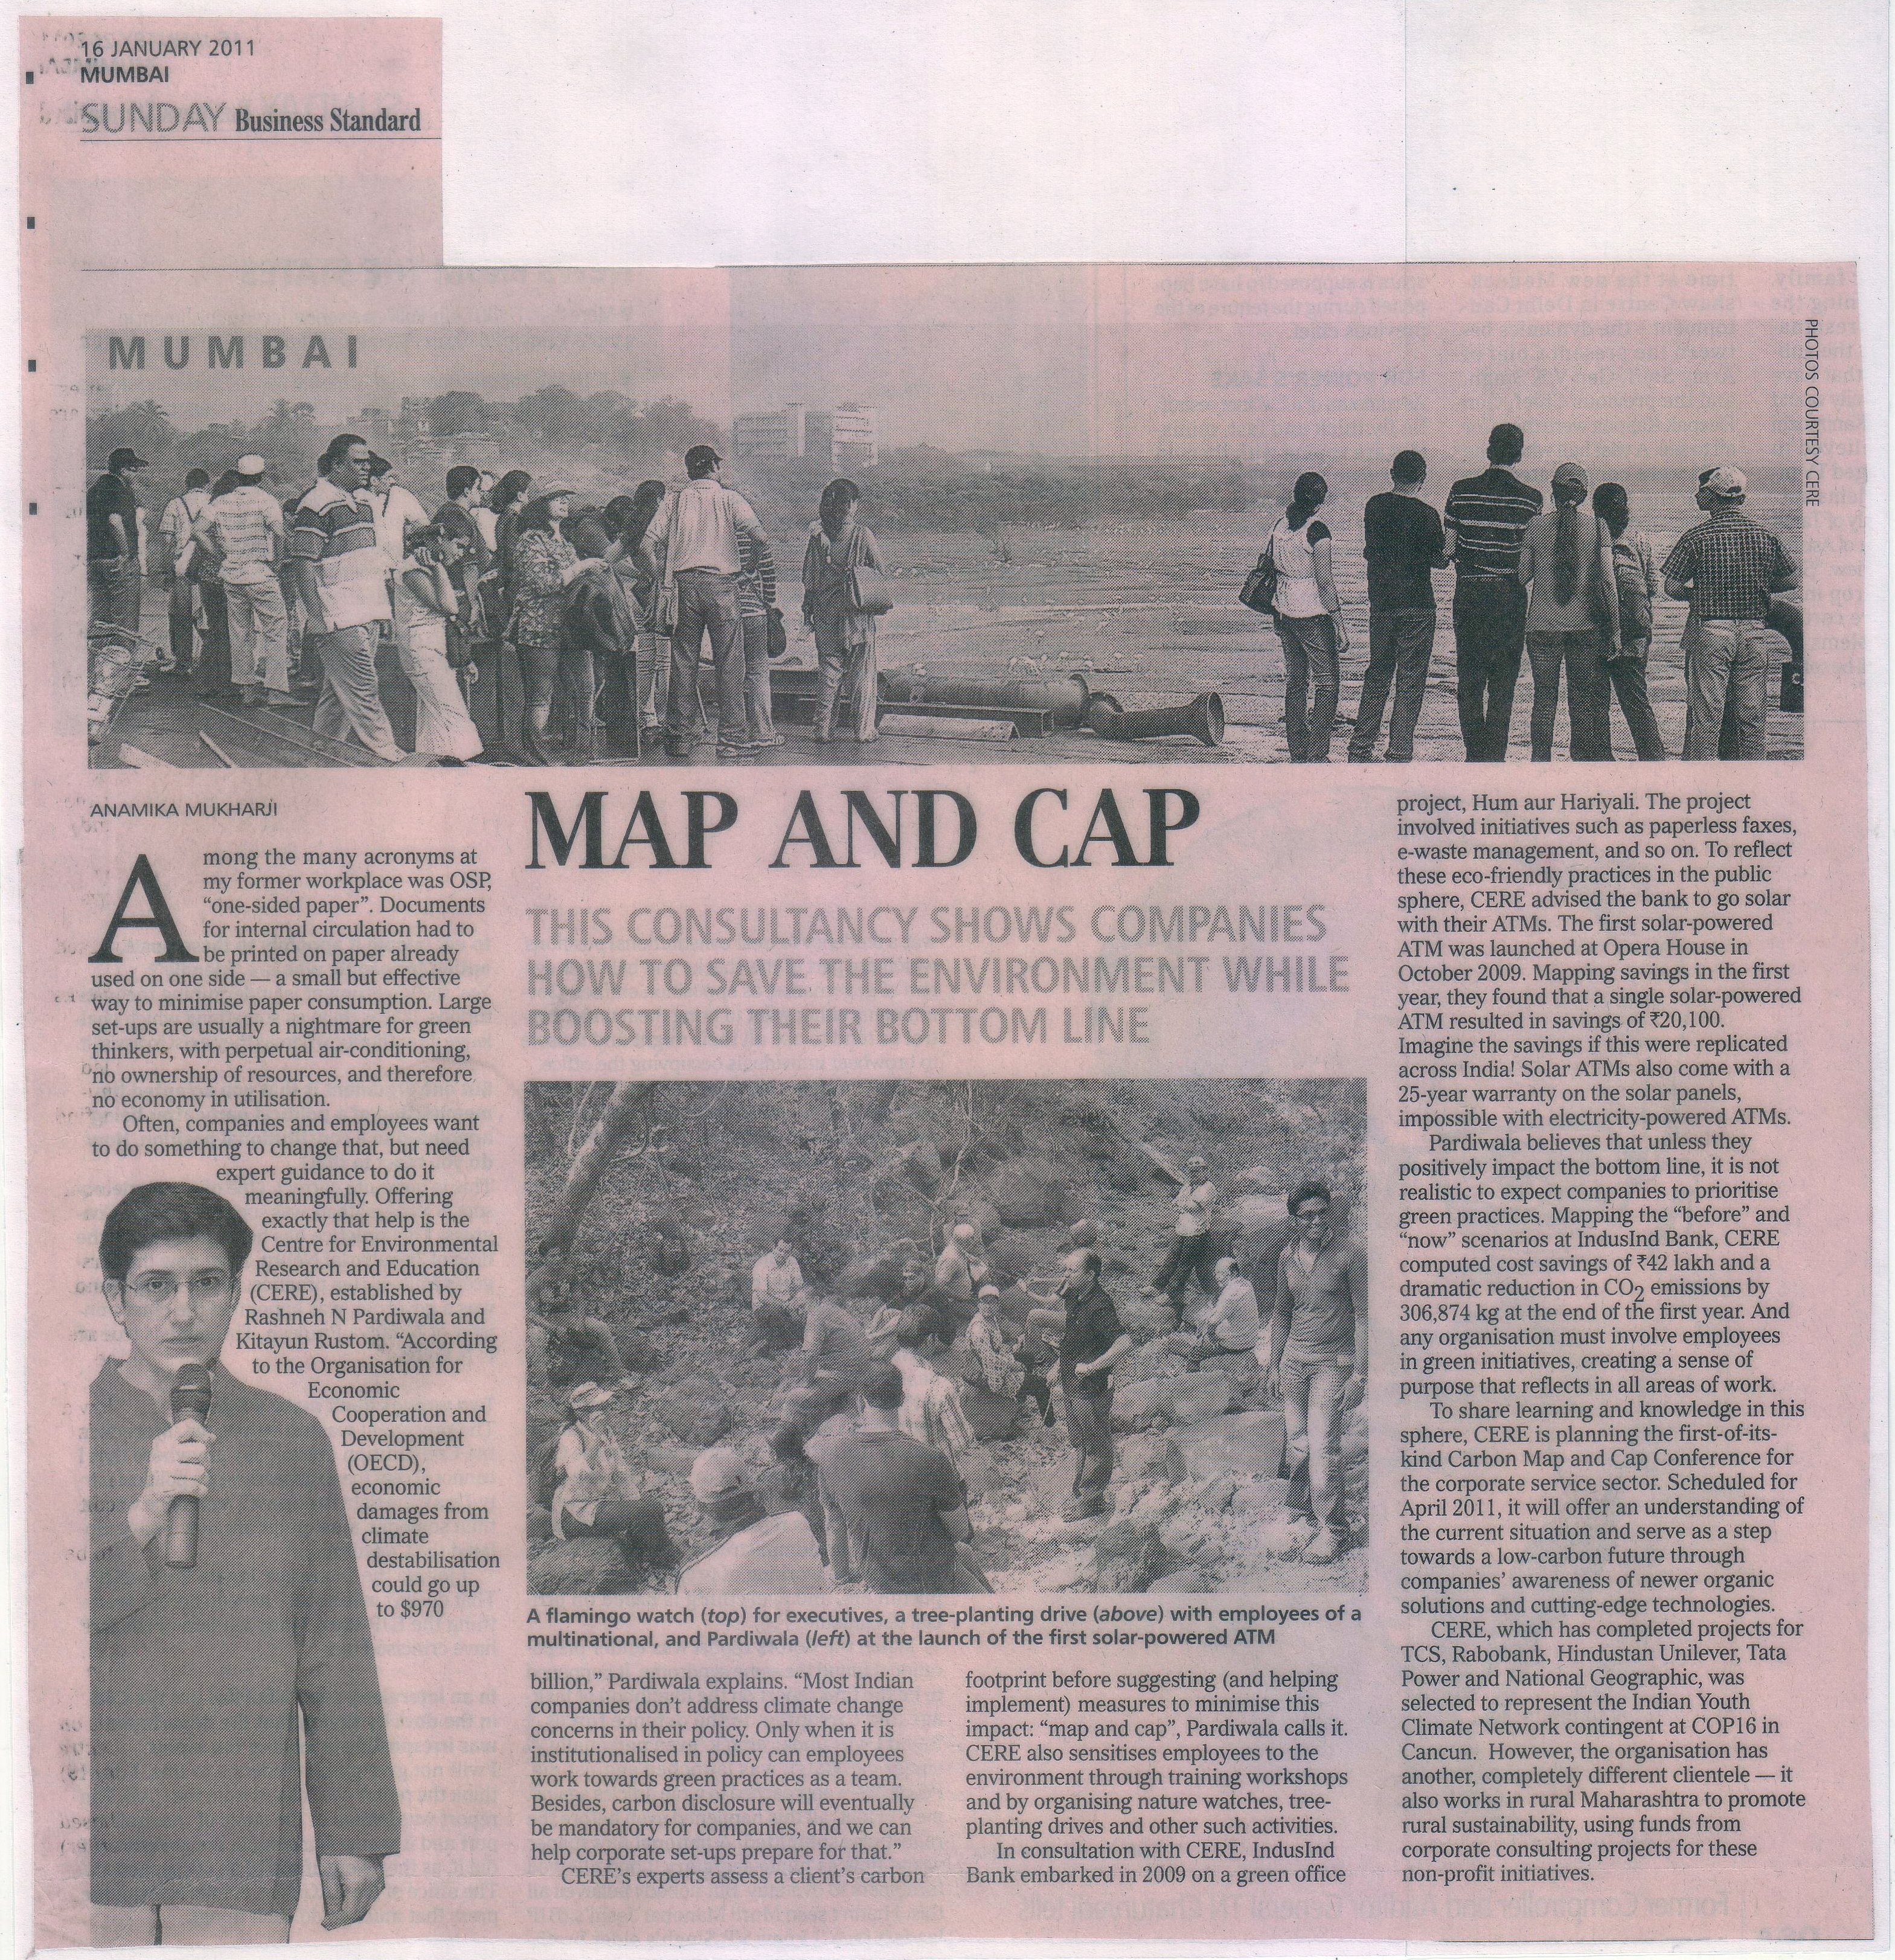 Business Standard - 16th January, 2011